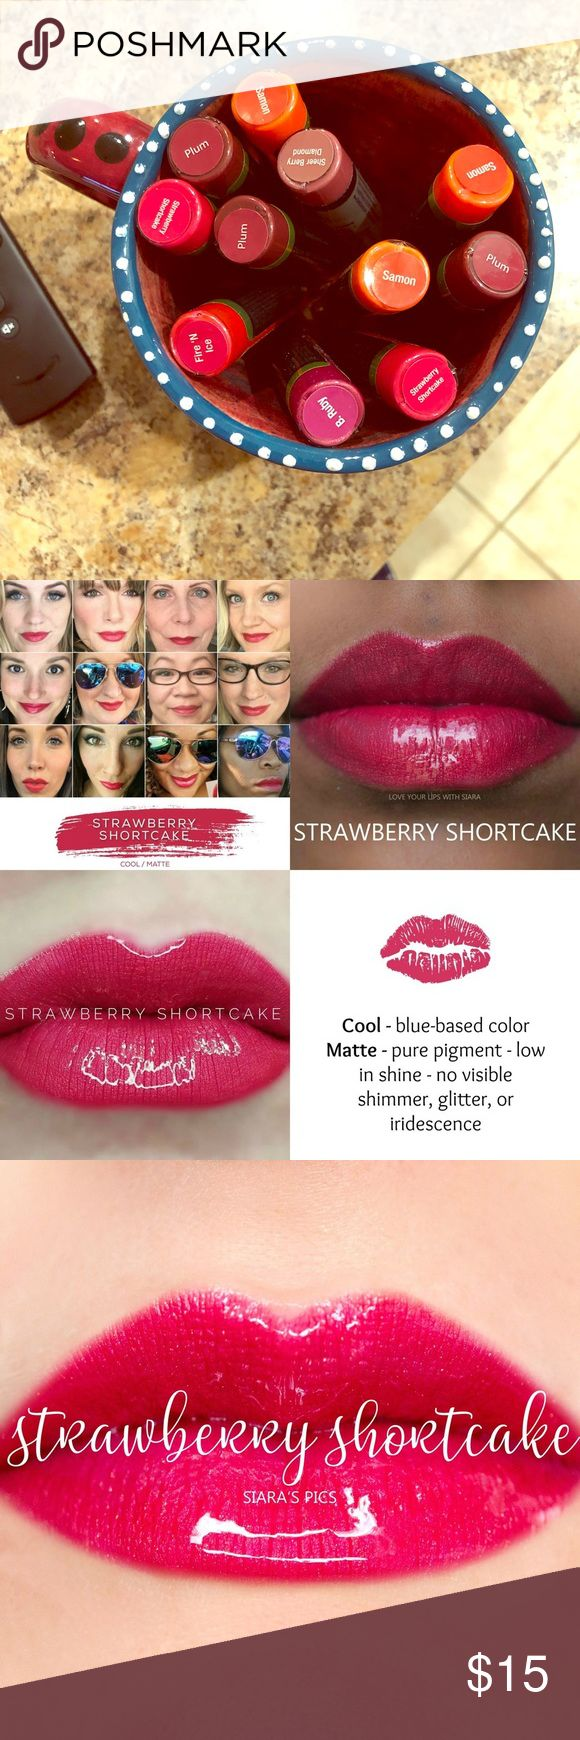 Lipsense 👄 Lip coloration Strawberry 🍓 Shortcake LipSense New by no means opened Stra…